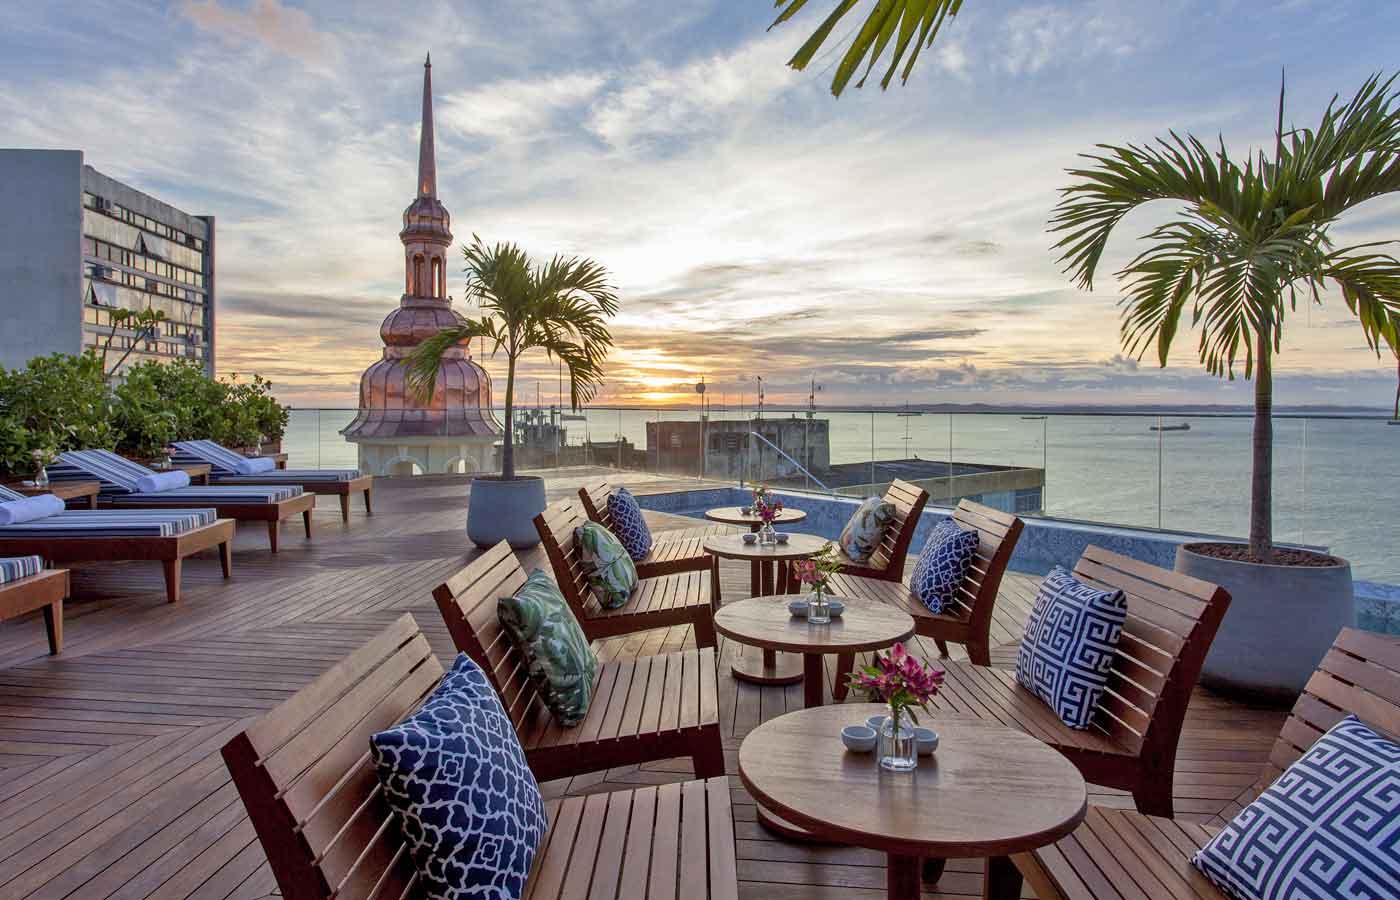 Hotel Fera Palace - Luxury holidays to Salvador, Brazil